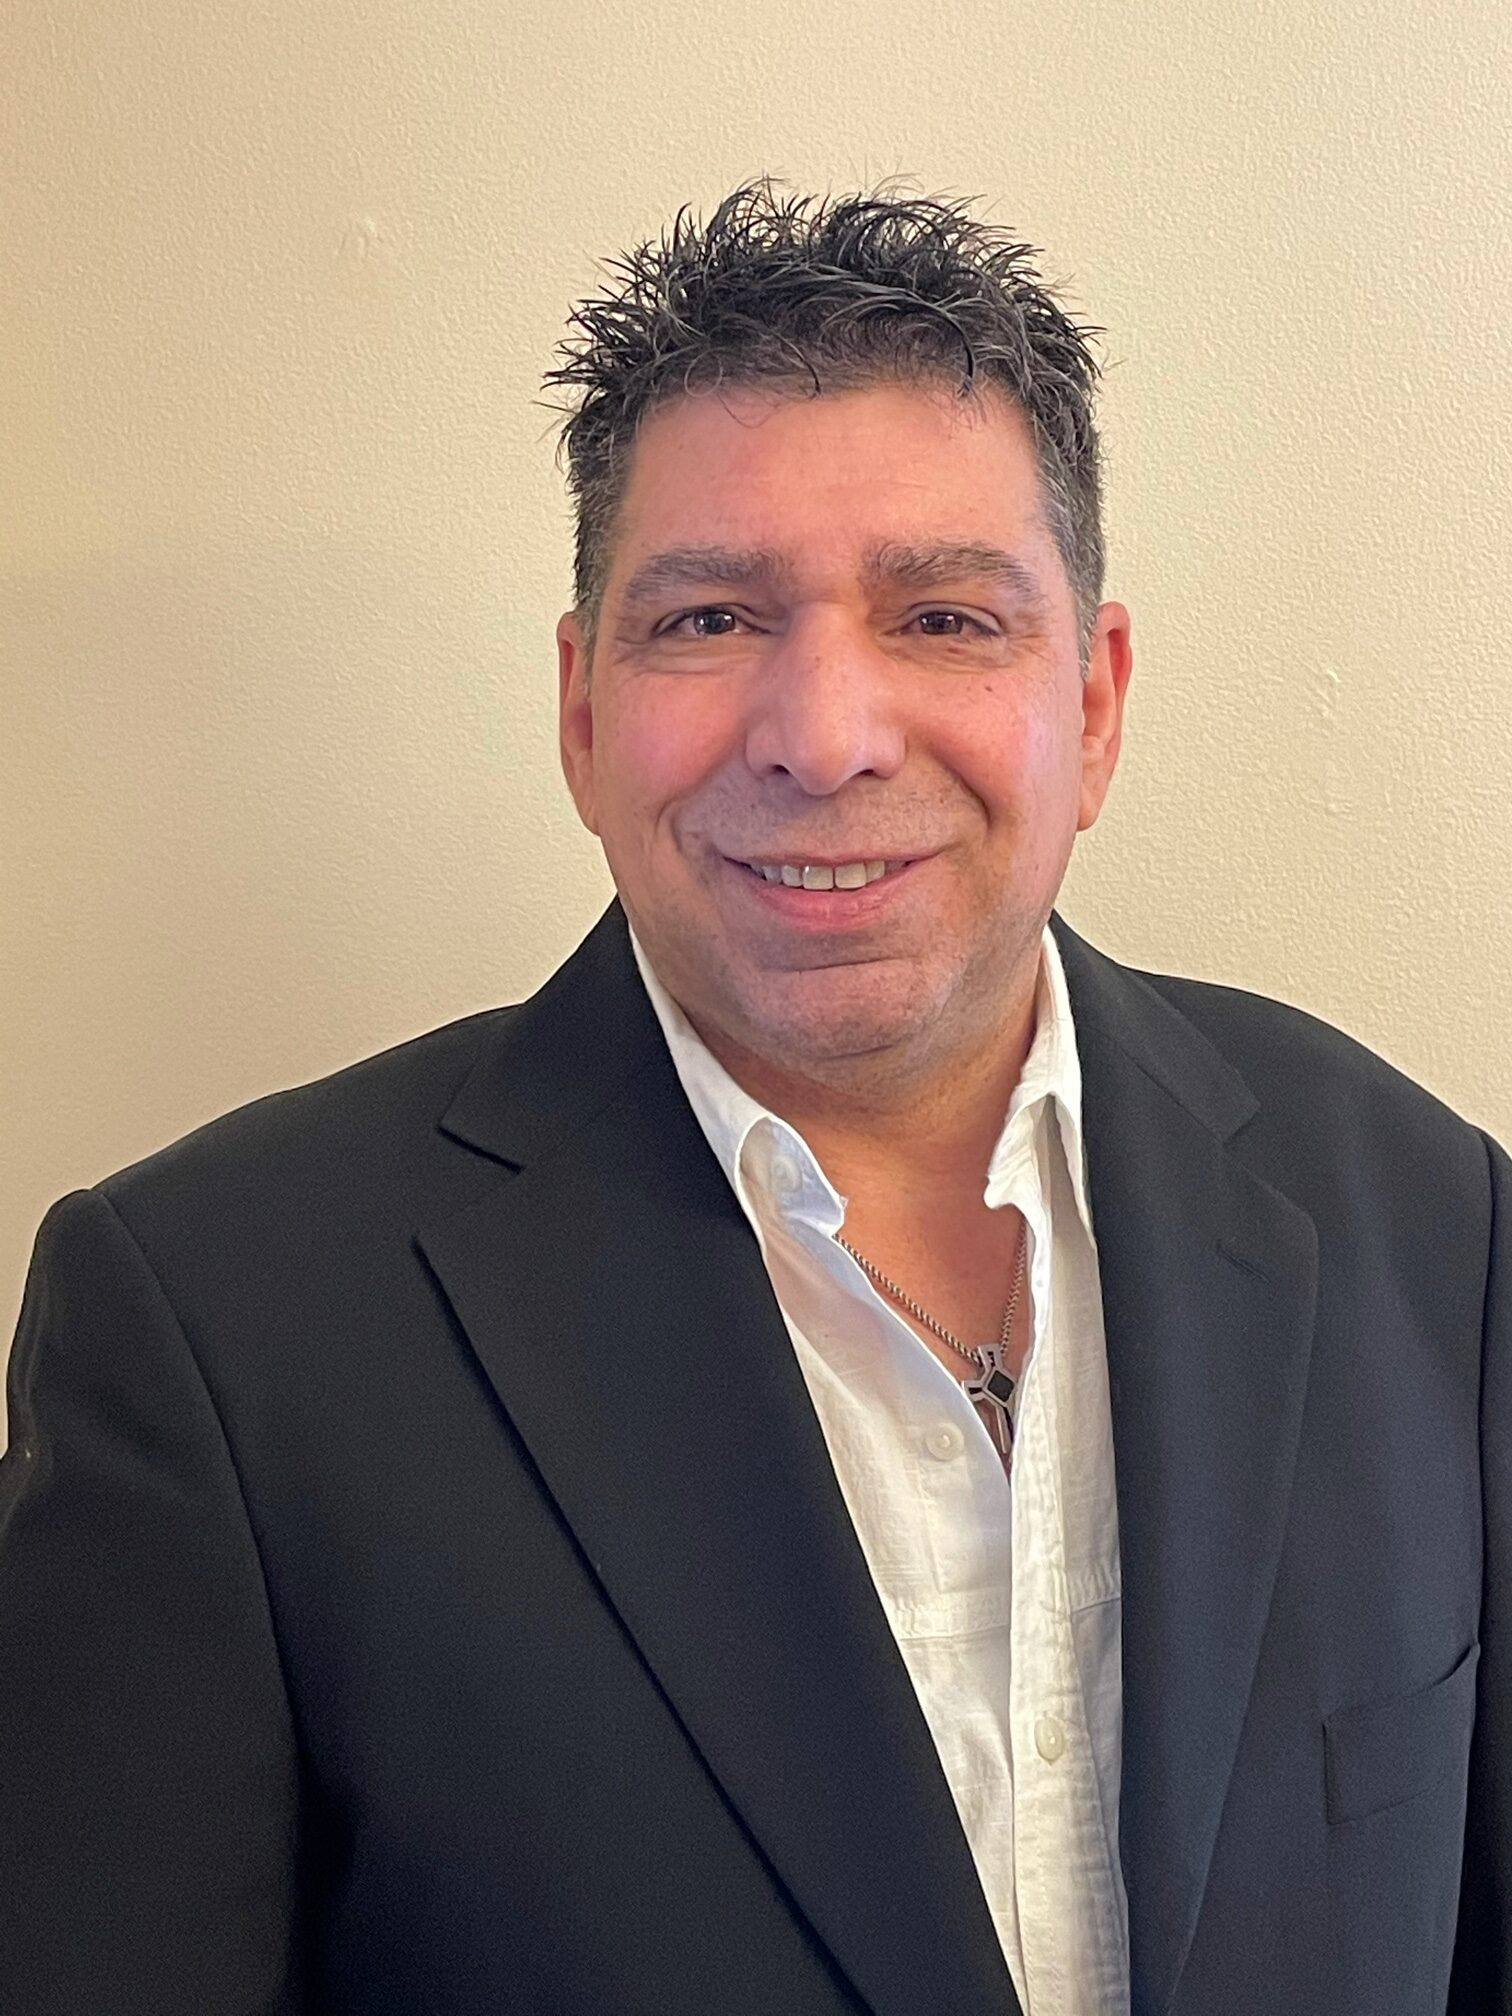 Stephen Attanasio